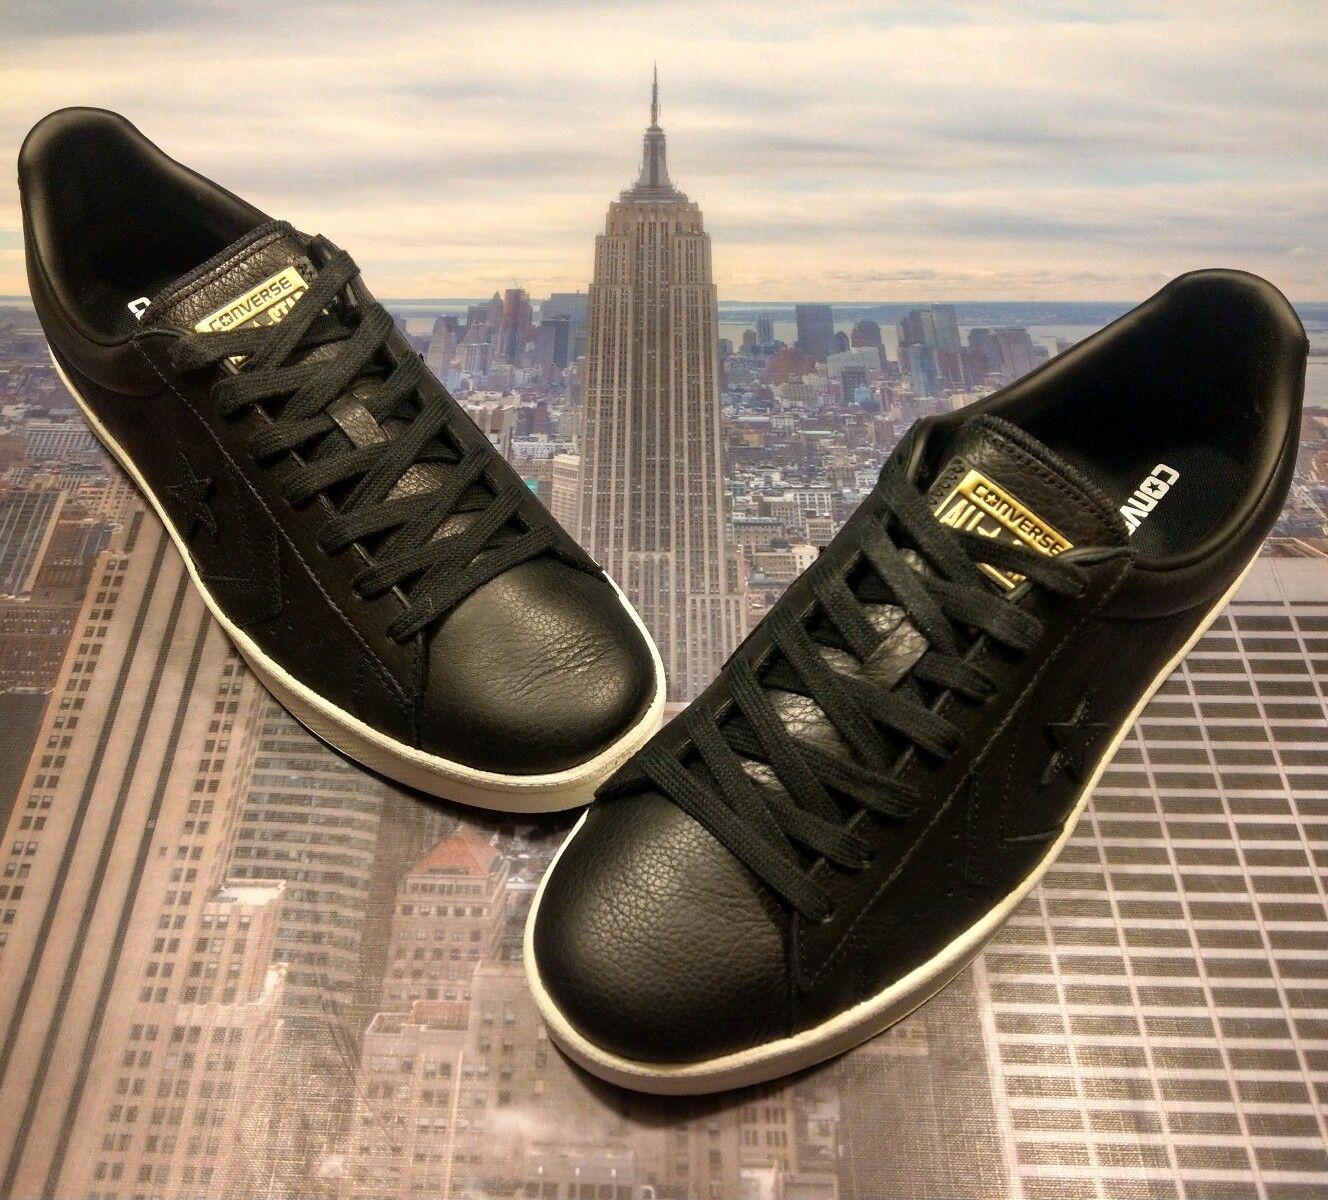 Converse Pro Leather 76 Ox Low Top Black Black-Egret Mens Size 11 157729c New